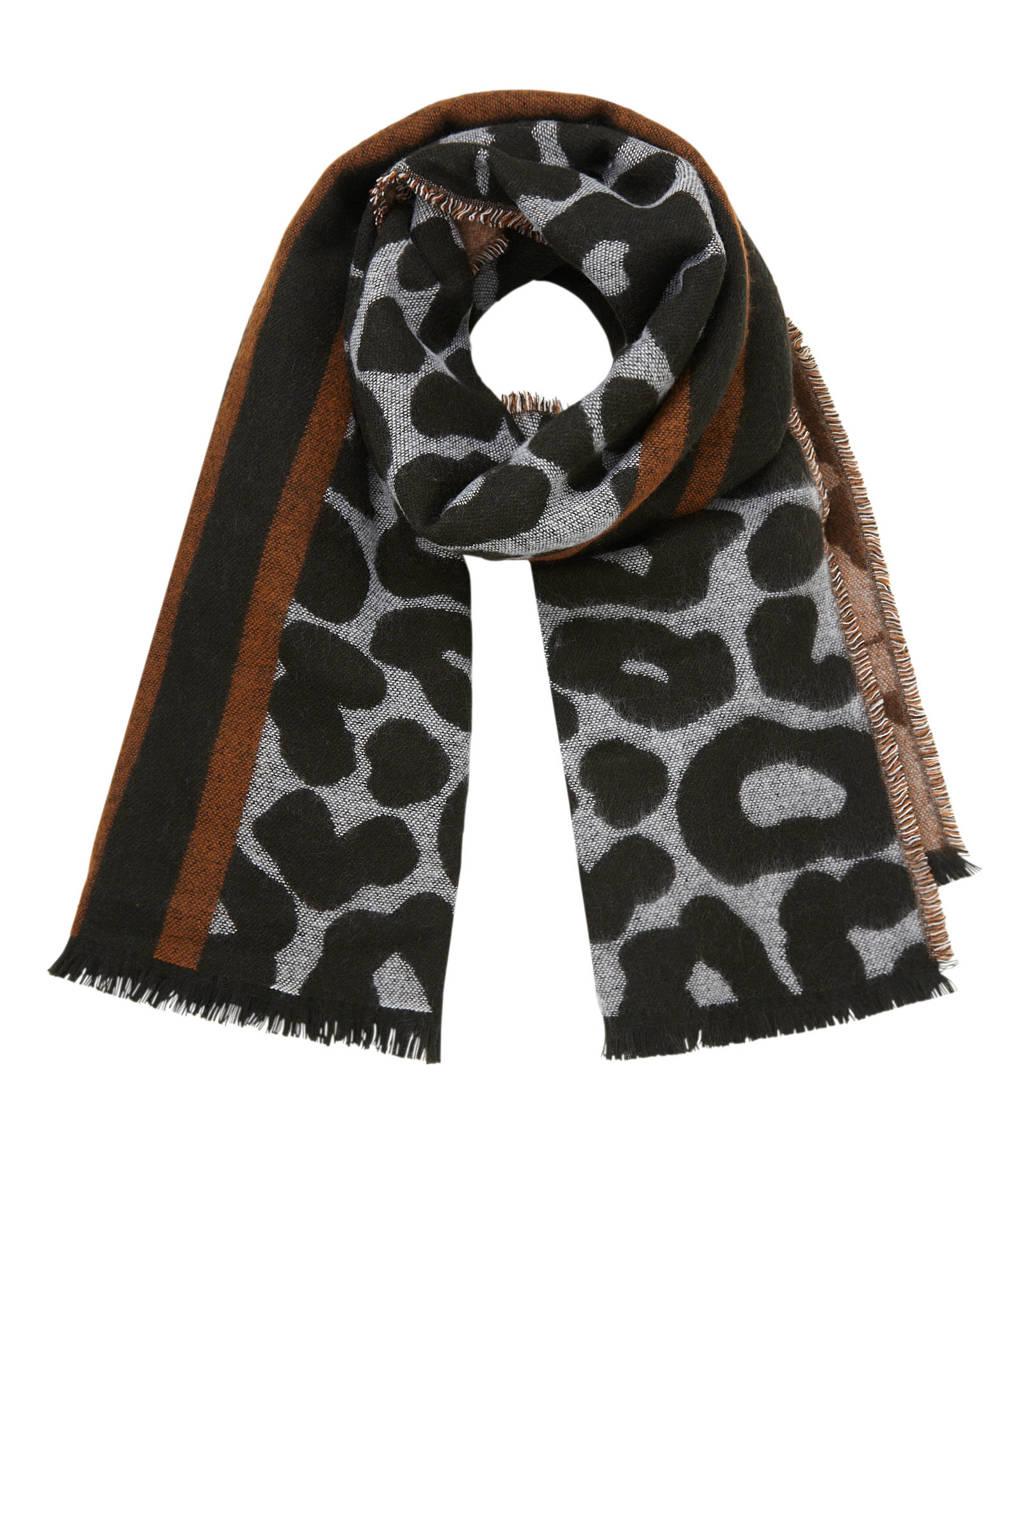 enorme verkoop voorbeeld van San Francisco sjaal met luipaardprint